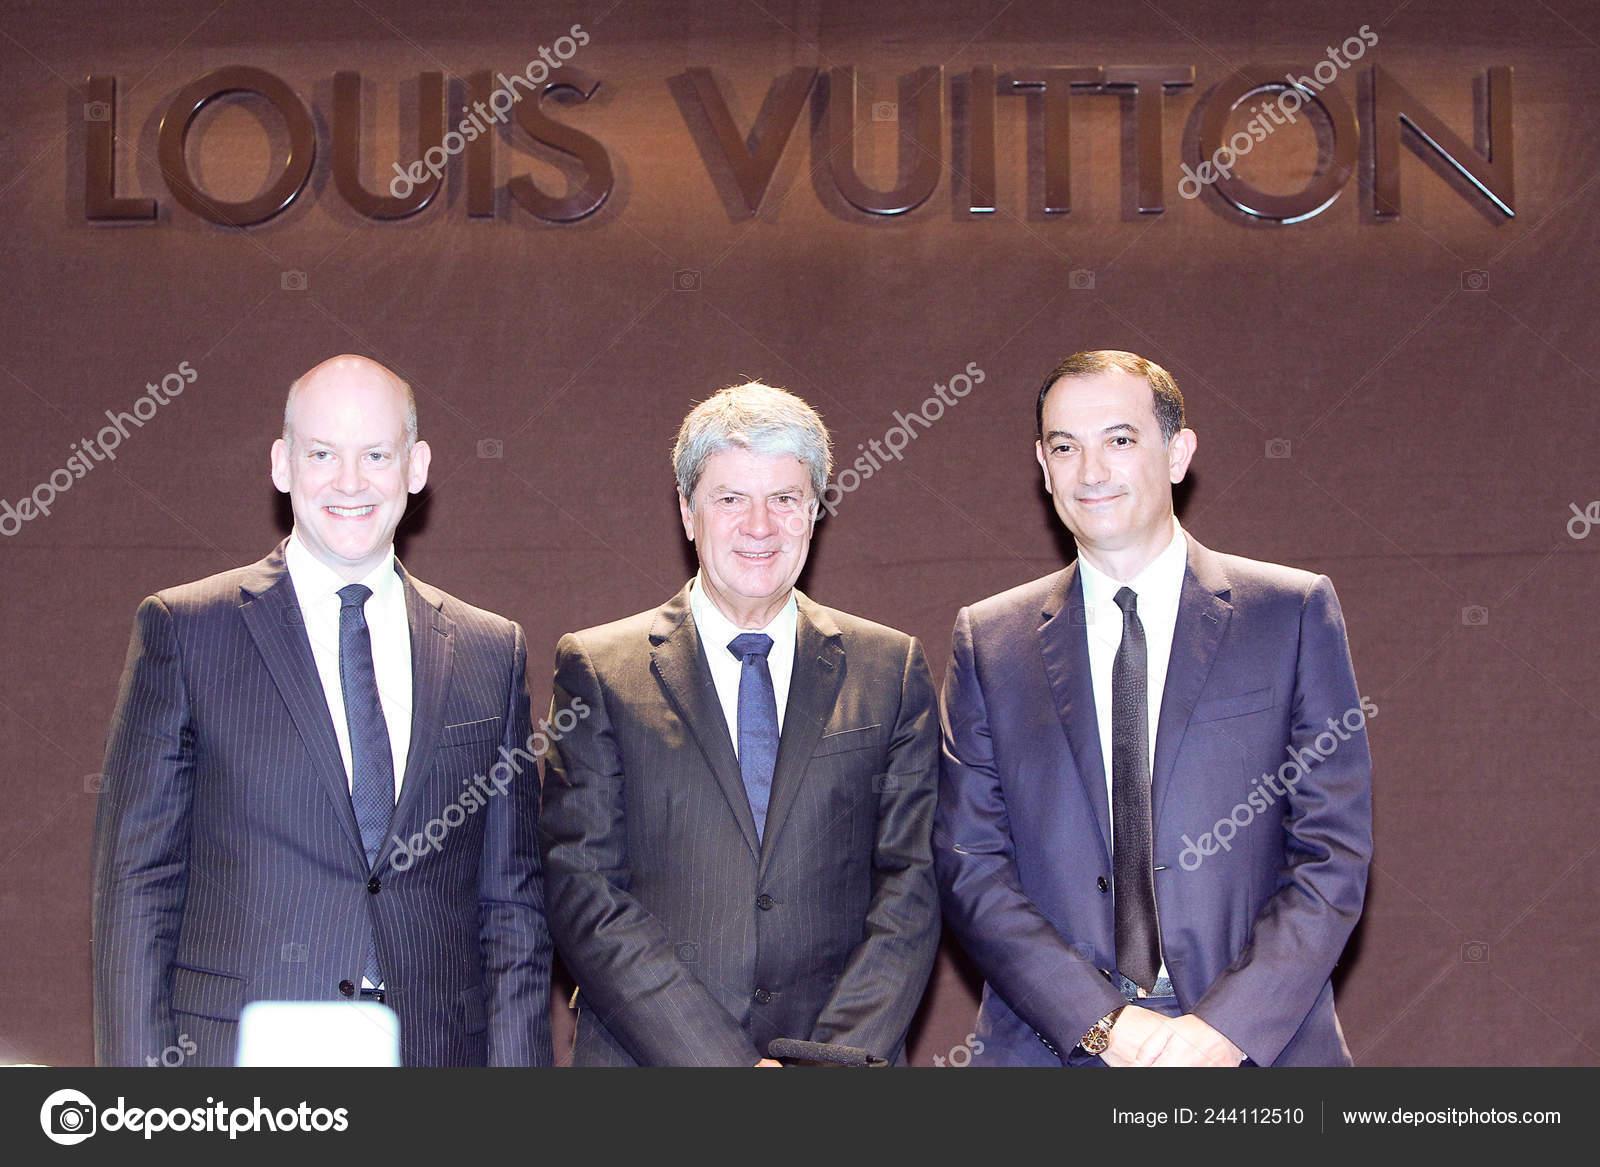 9afe7621bdb Left Executive Vice President Louis Vuitton Christopher Zanardi ...